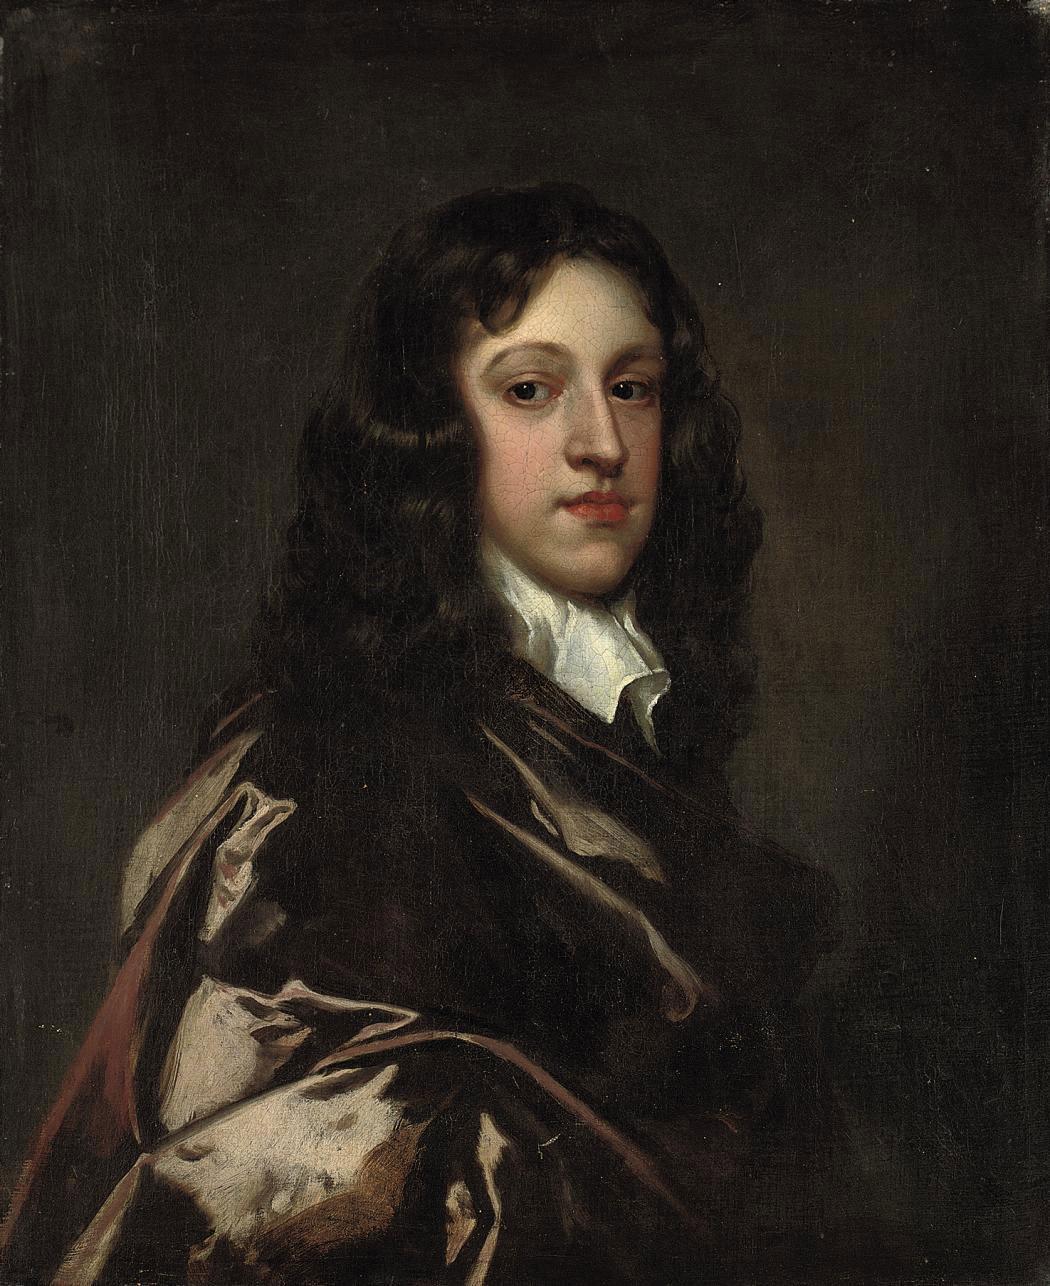 Portrait of Samuel Lee (b. 1639), half-length, in a brown cloak